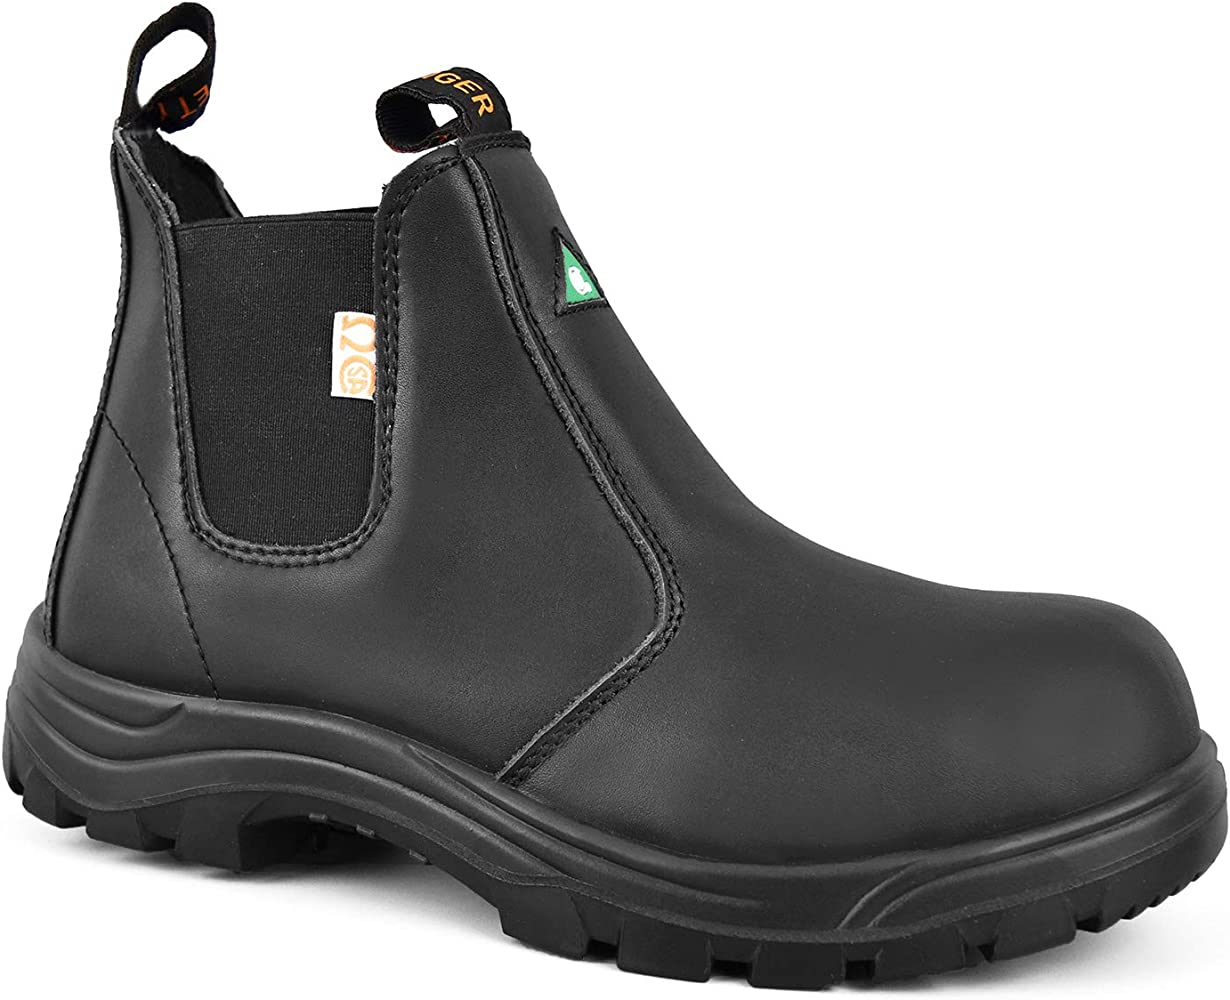 Tiger Safety Men's Leather Steel Toe